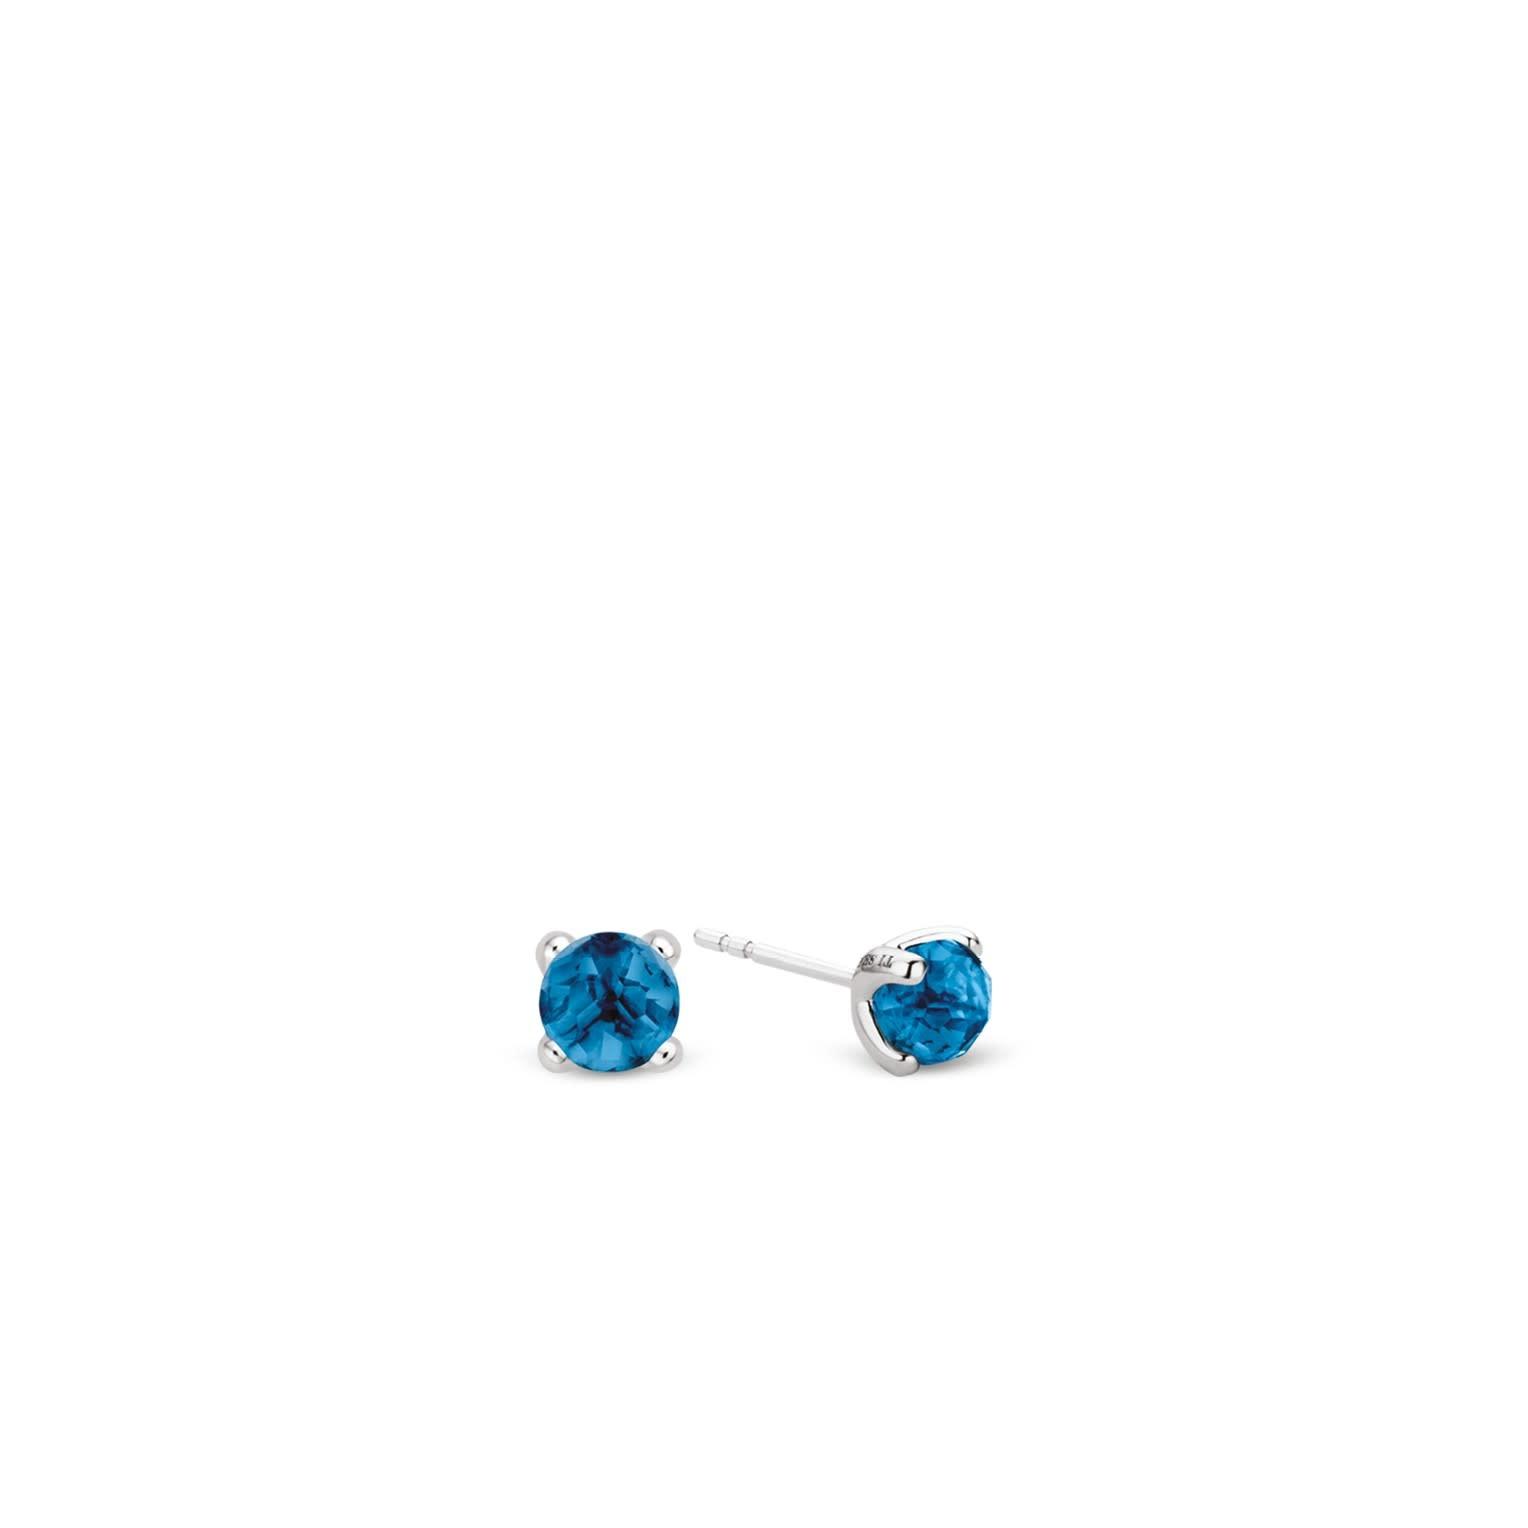 TI SENTO - Milano Earrings 7768DB-1